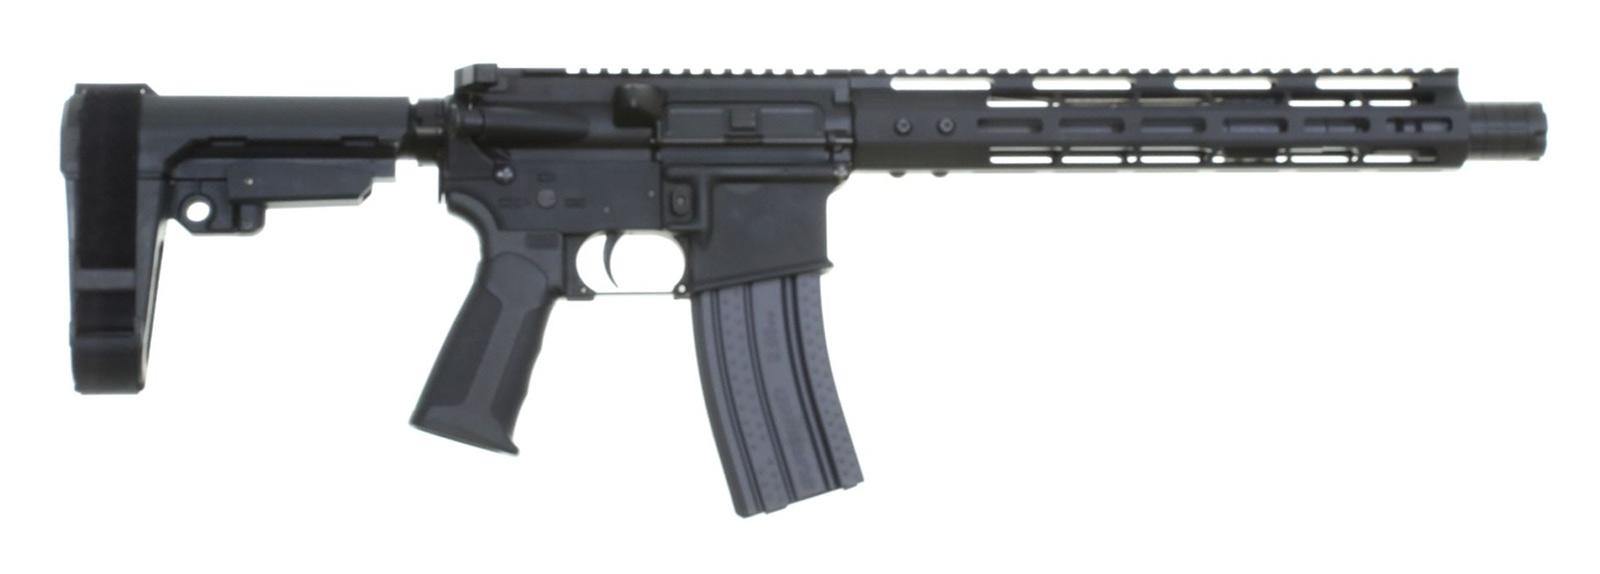 cbc-ps2-forged-aluminum-ar-pistol-5-56-nato-10-5-barrel-m-lok-rail-sba3-brace-ambi-ch